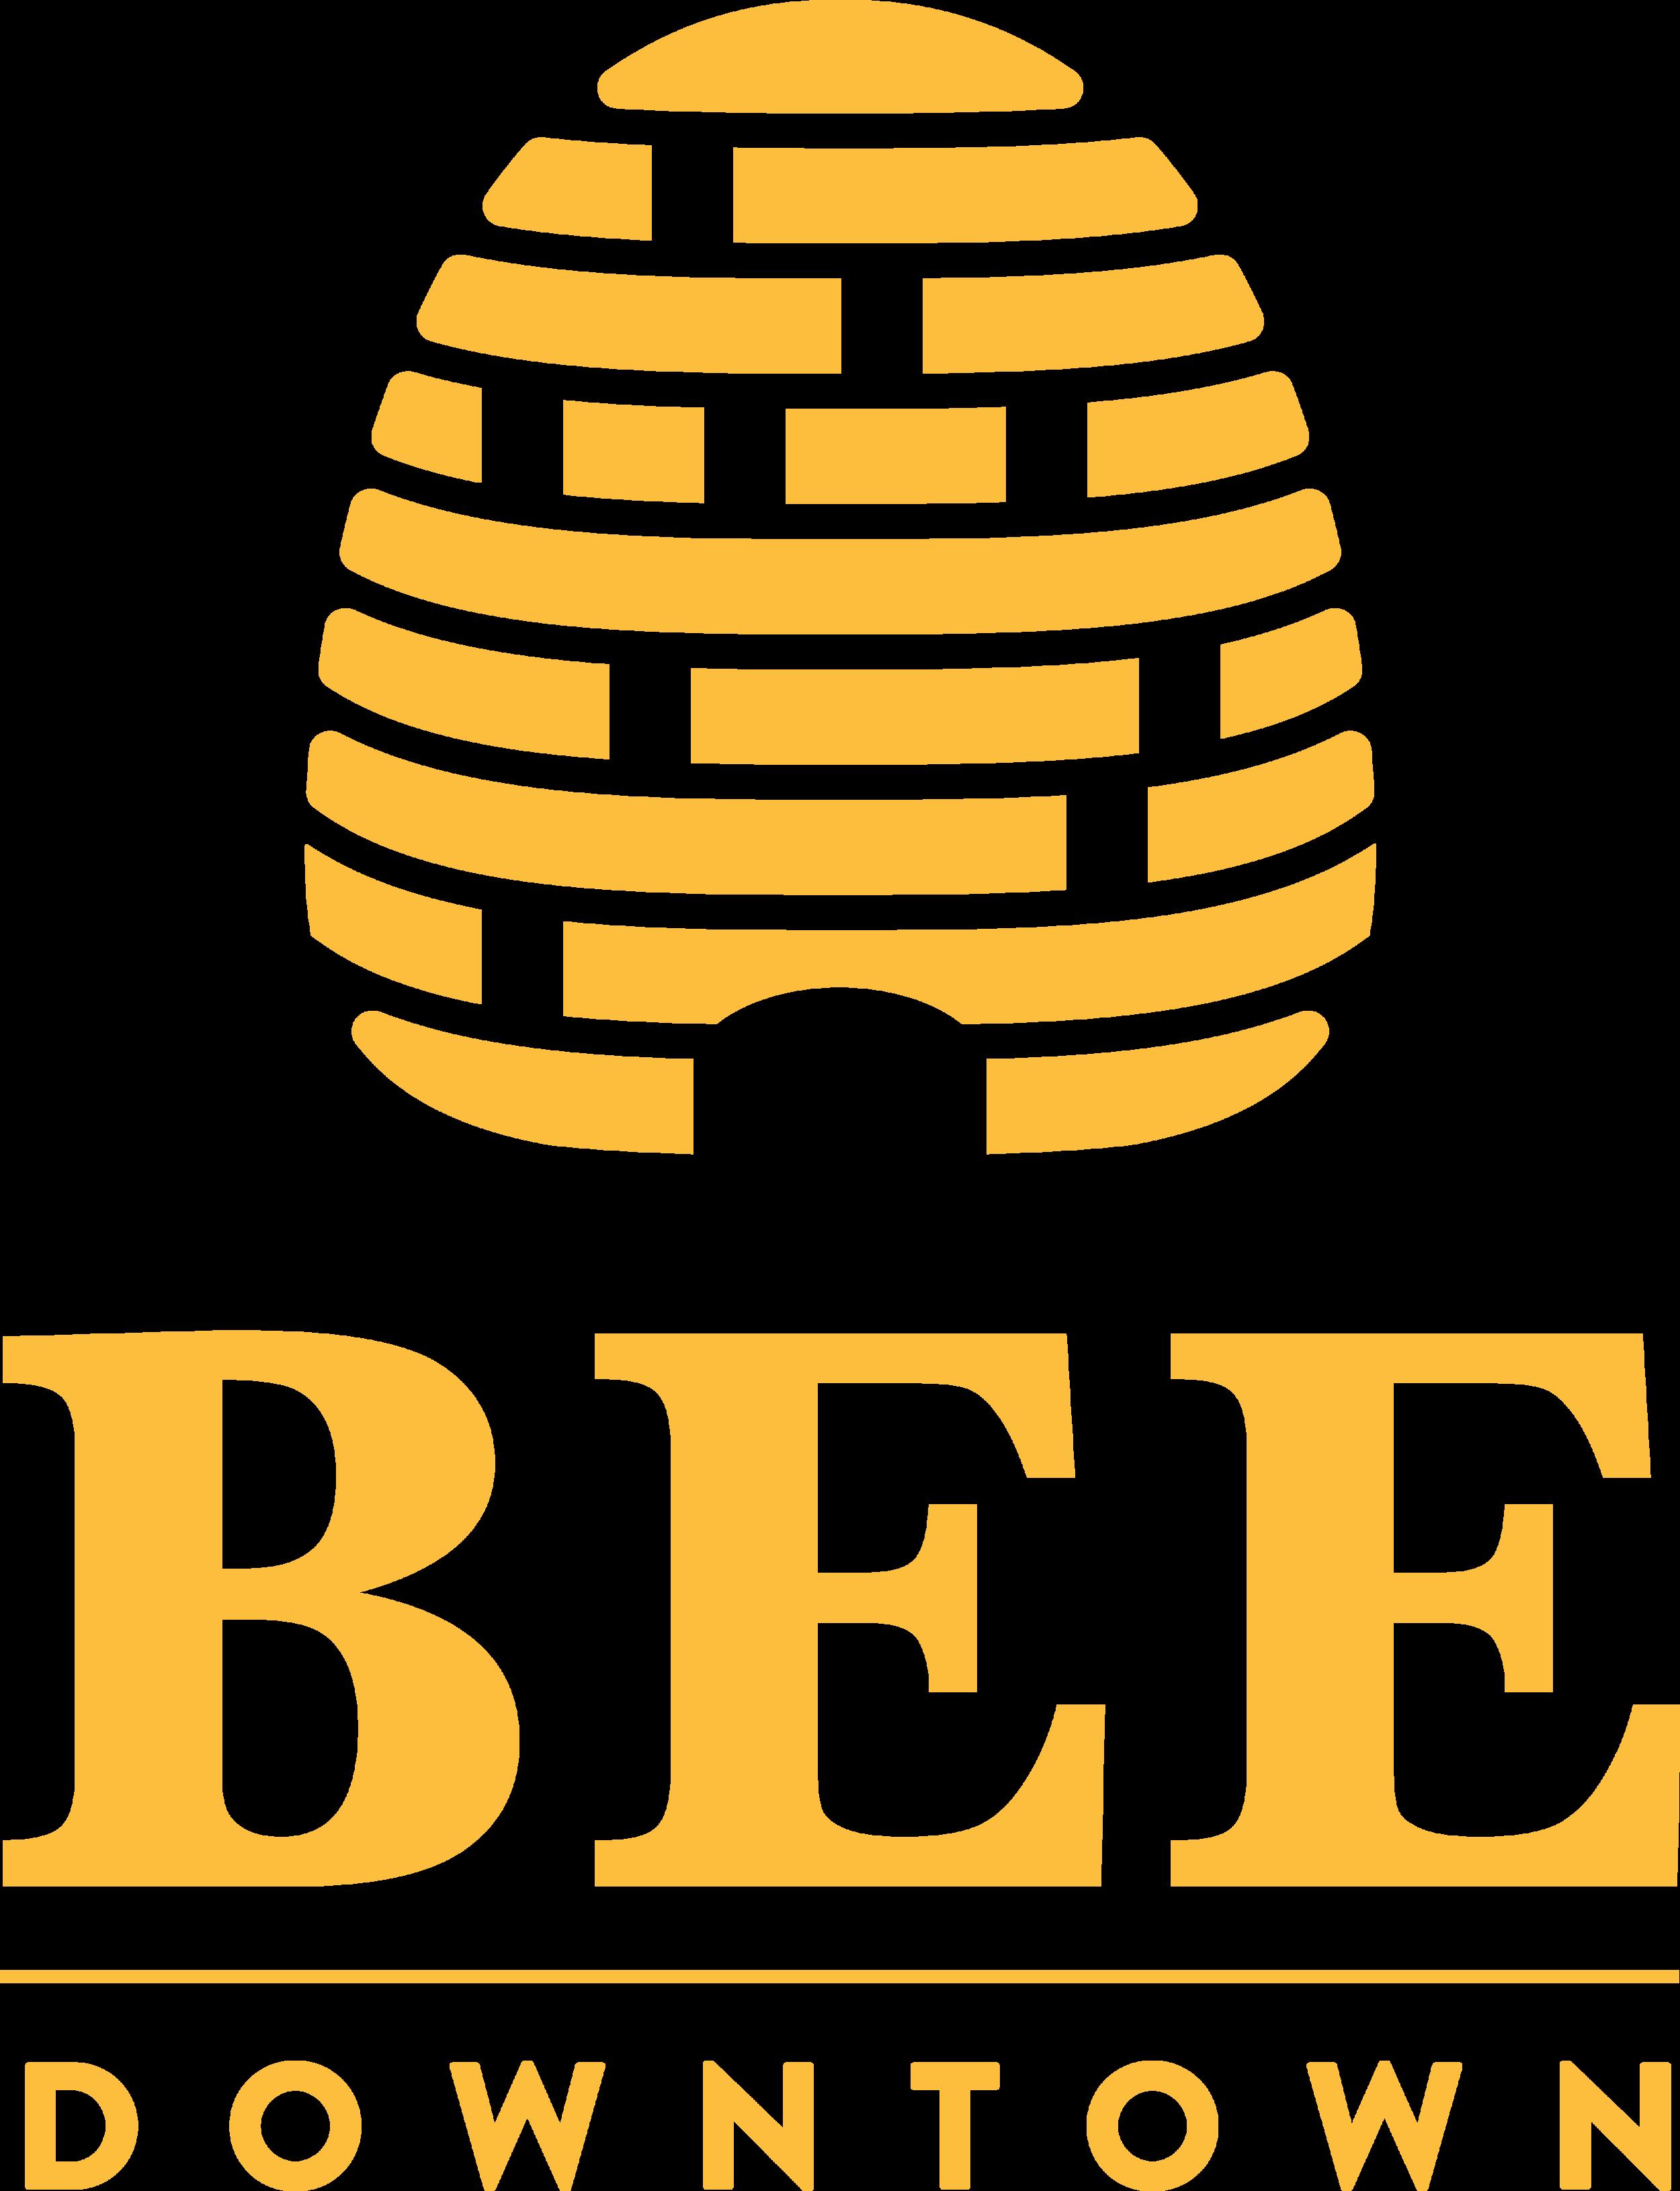 BD_Vert-Yellow.png